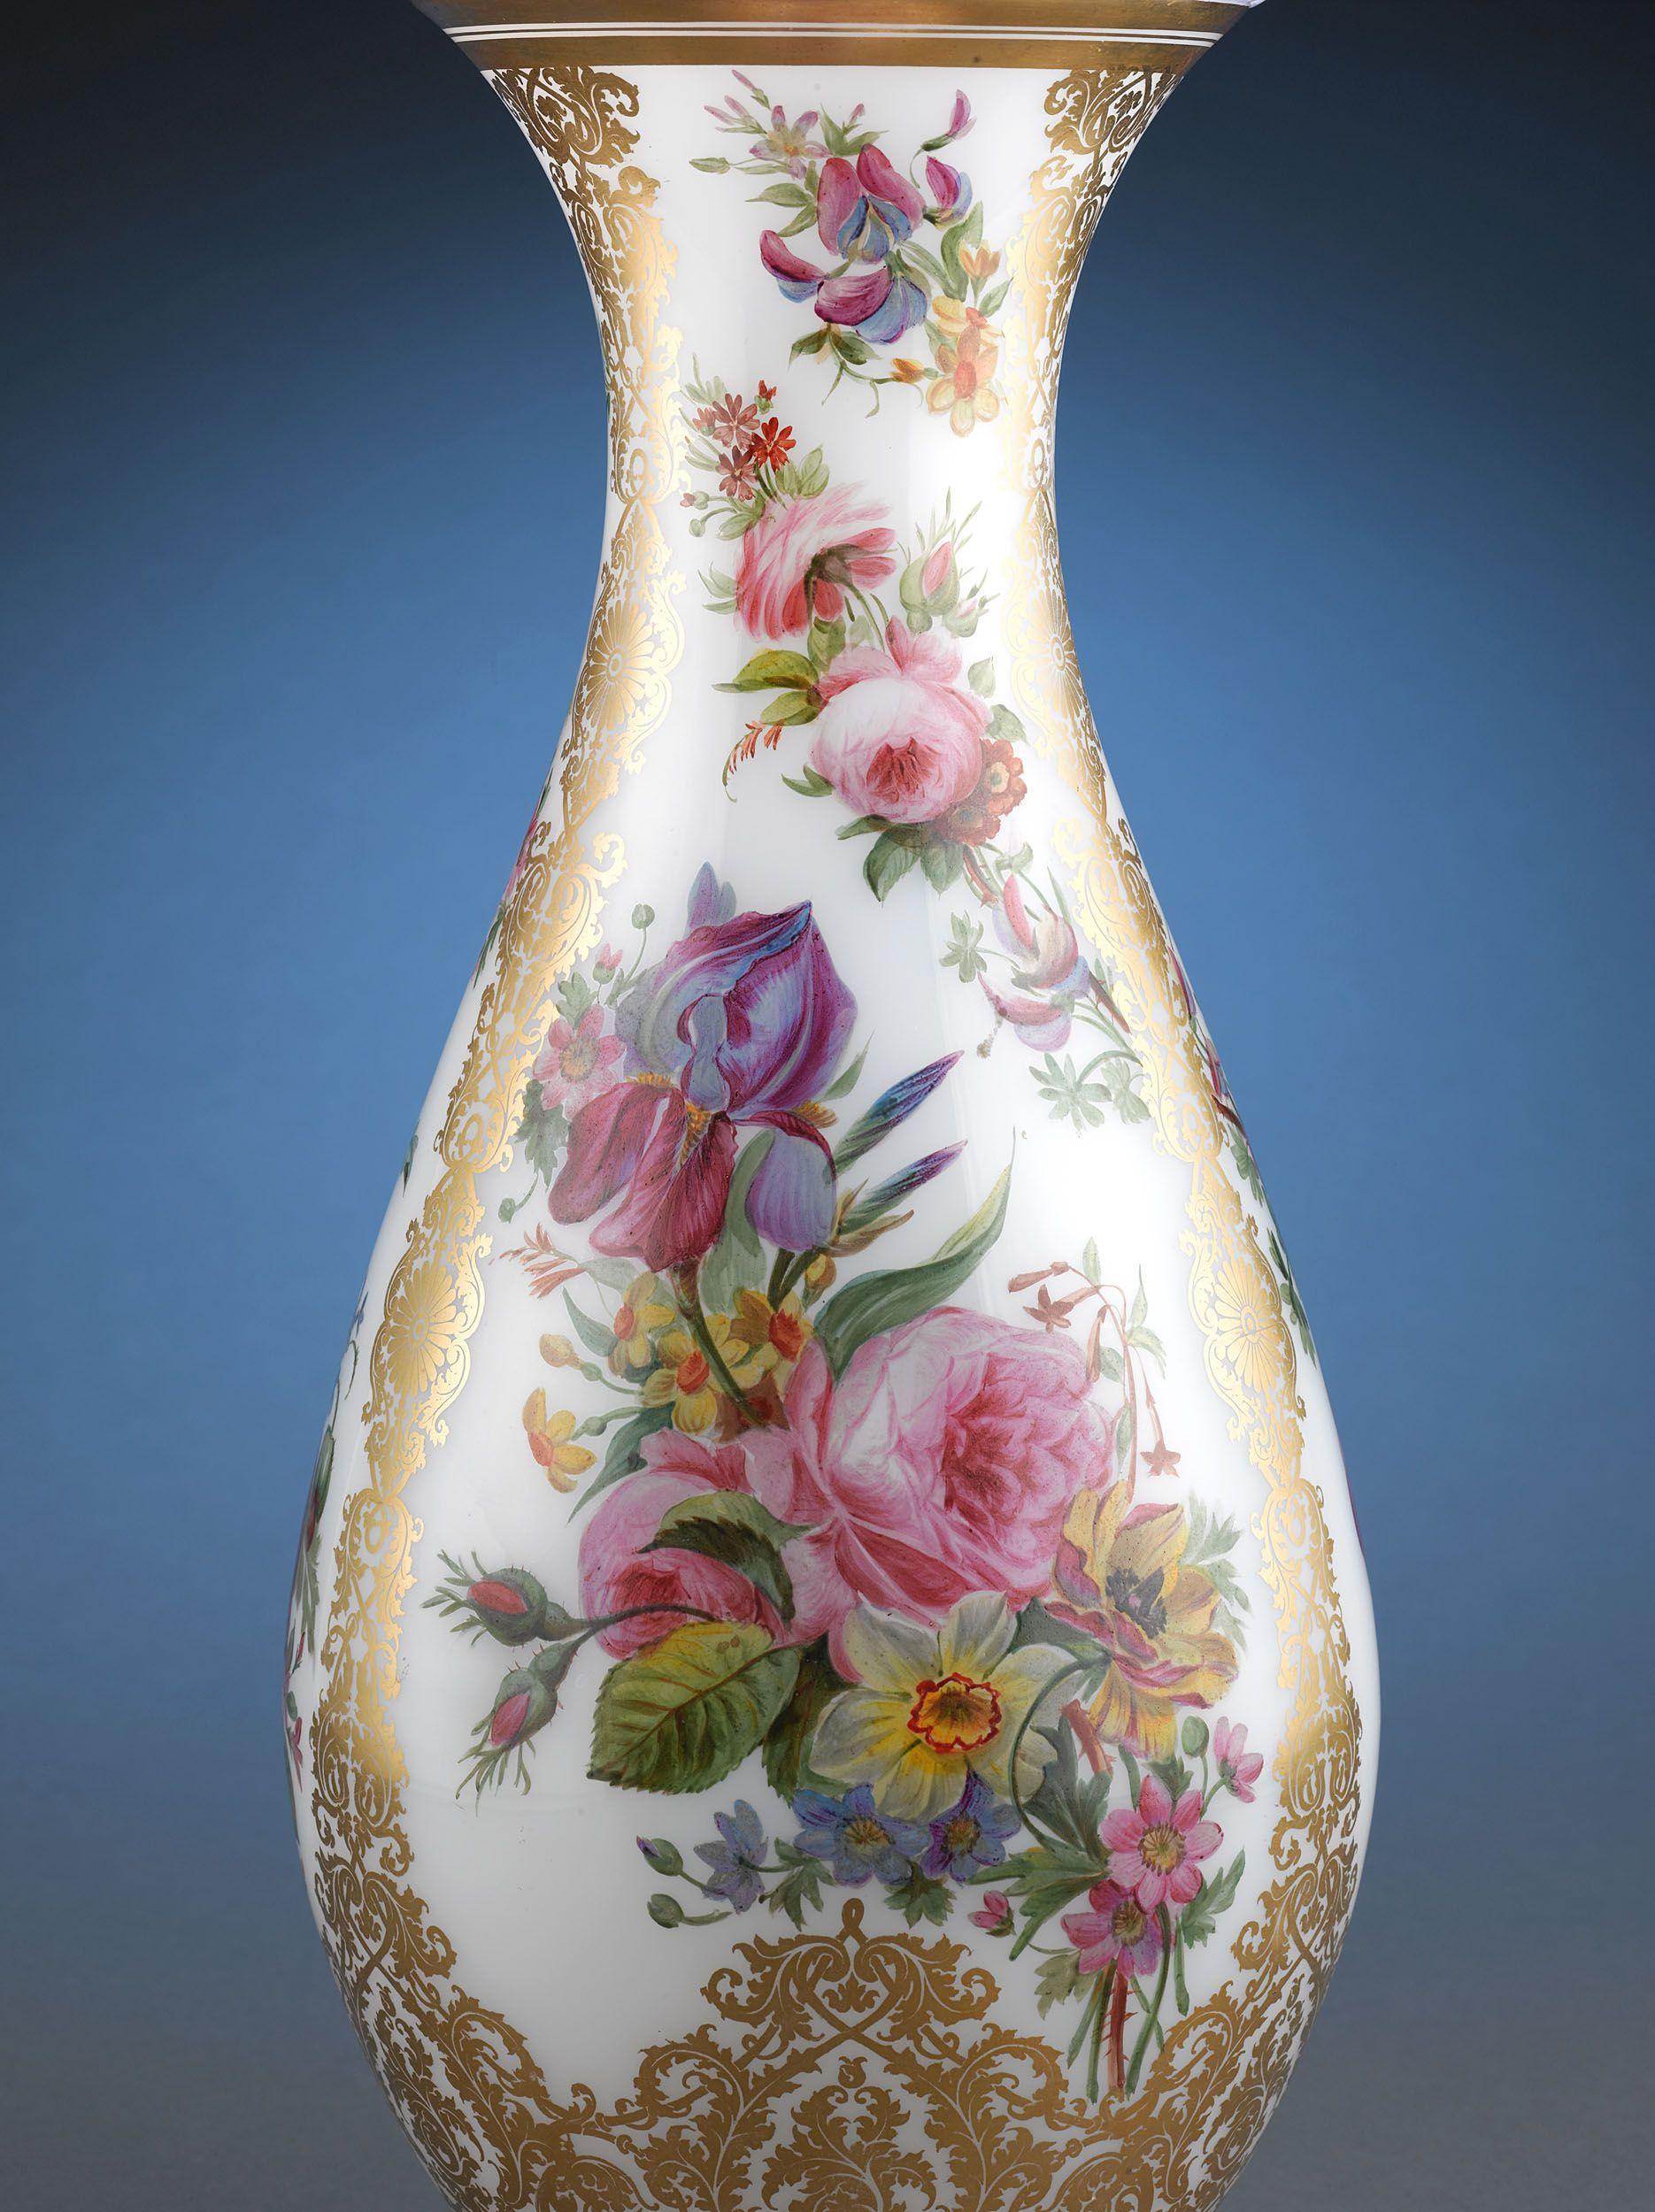 Antique glass baccarat glass opaline glass vase ms rau antique glass baccarat glass opaline glass vase ms rau antiques reviewsmspy